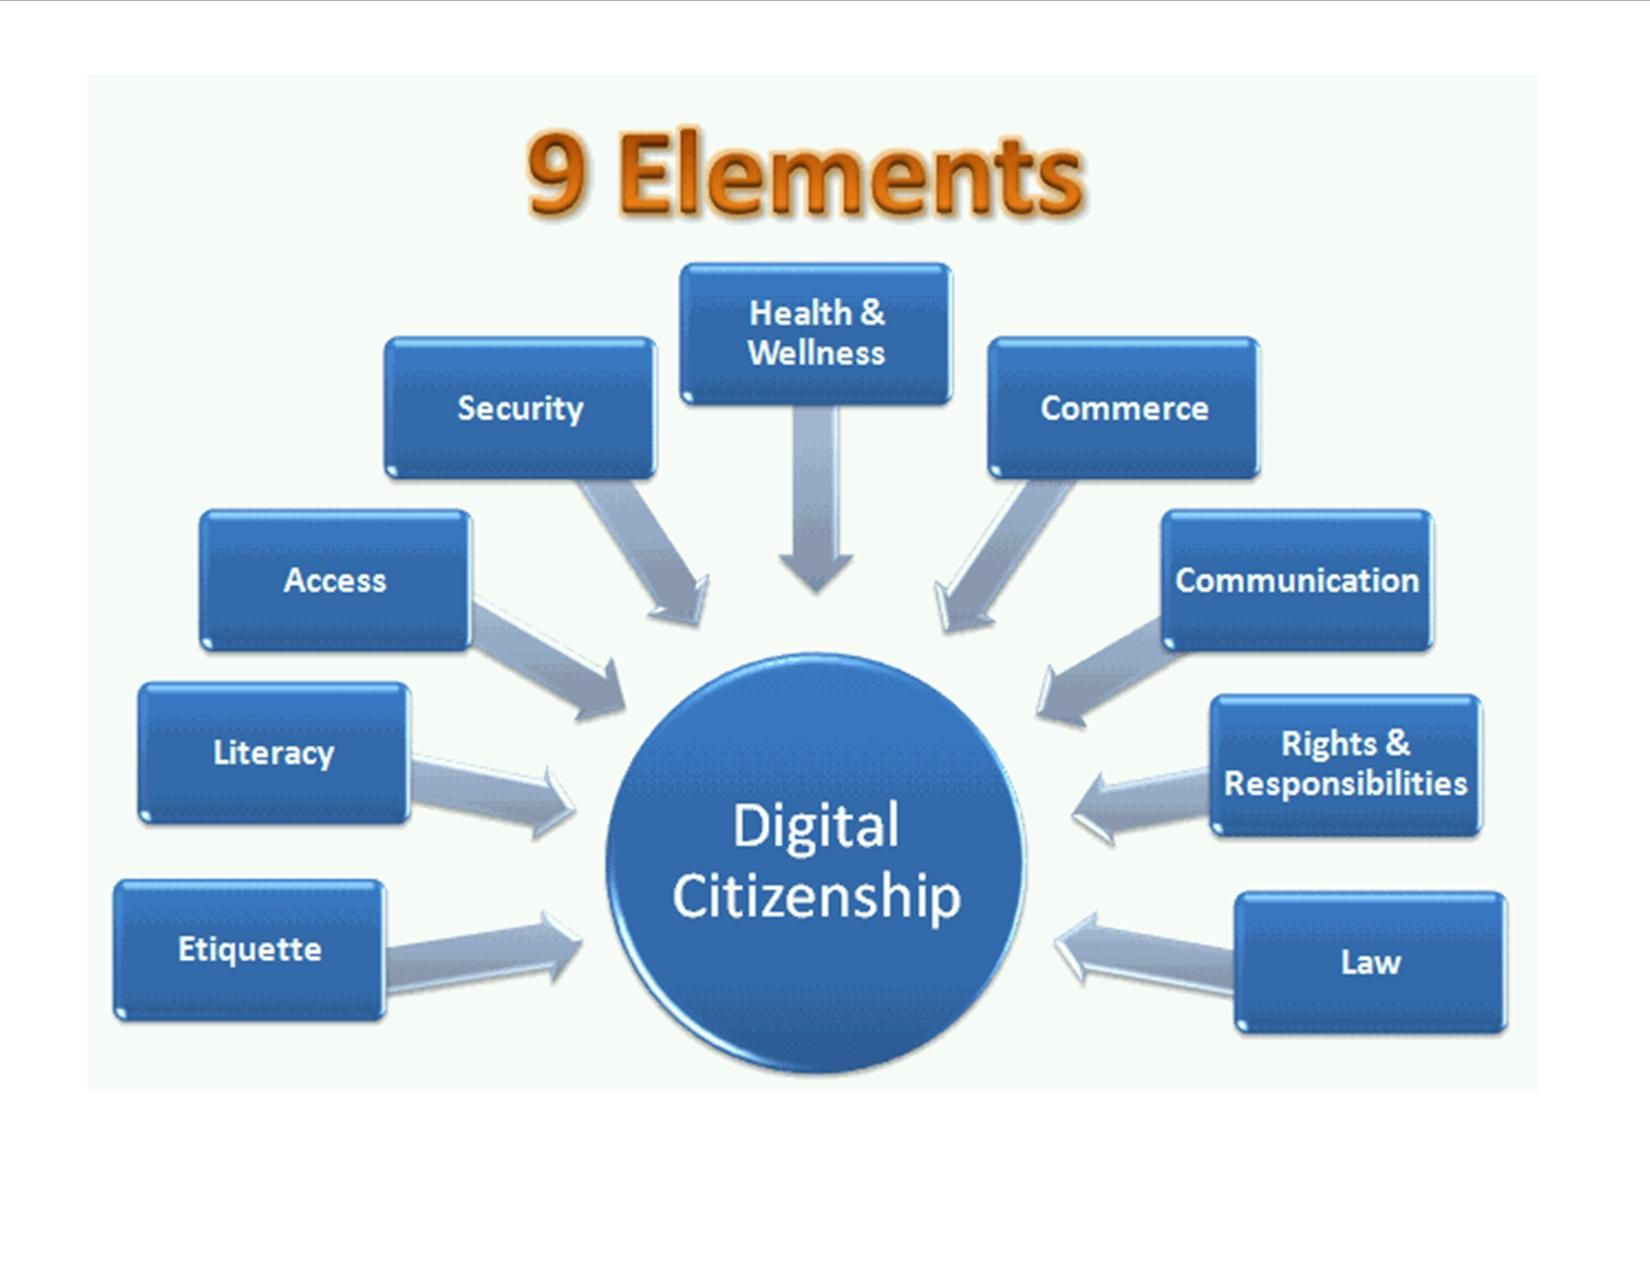 9 ELEMENTS of Digital citizenship | Digital Citizenship ...